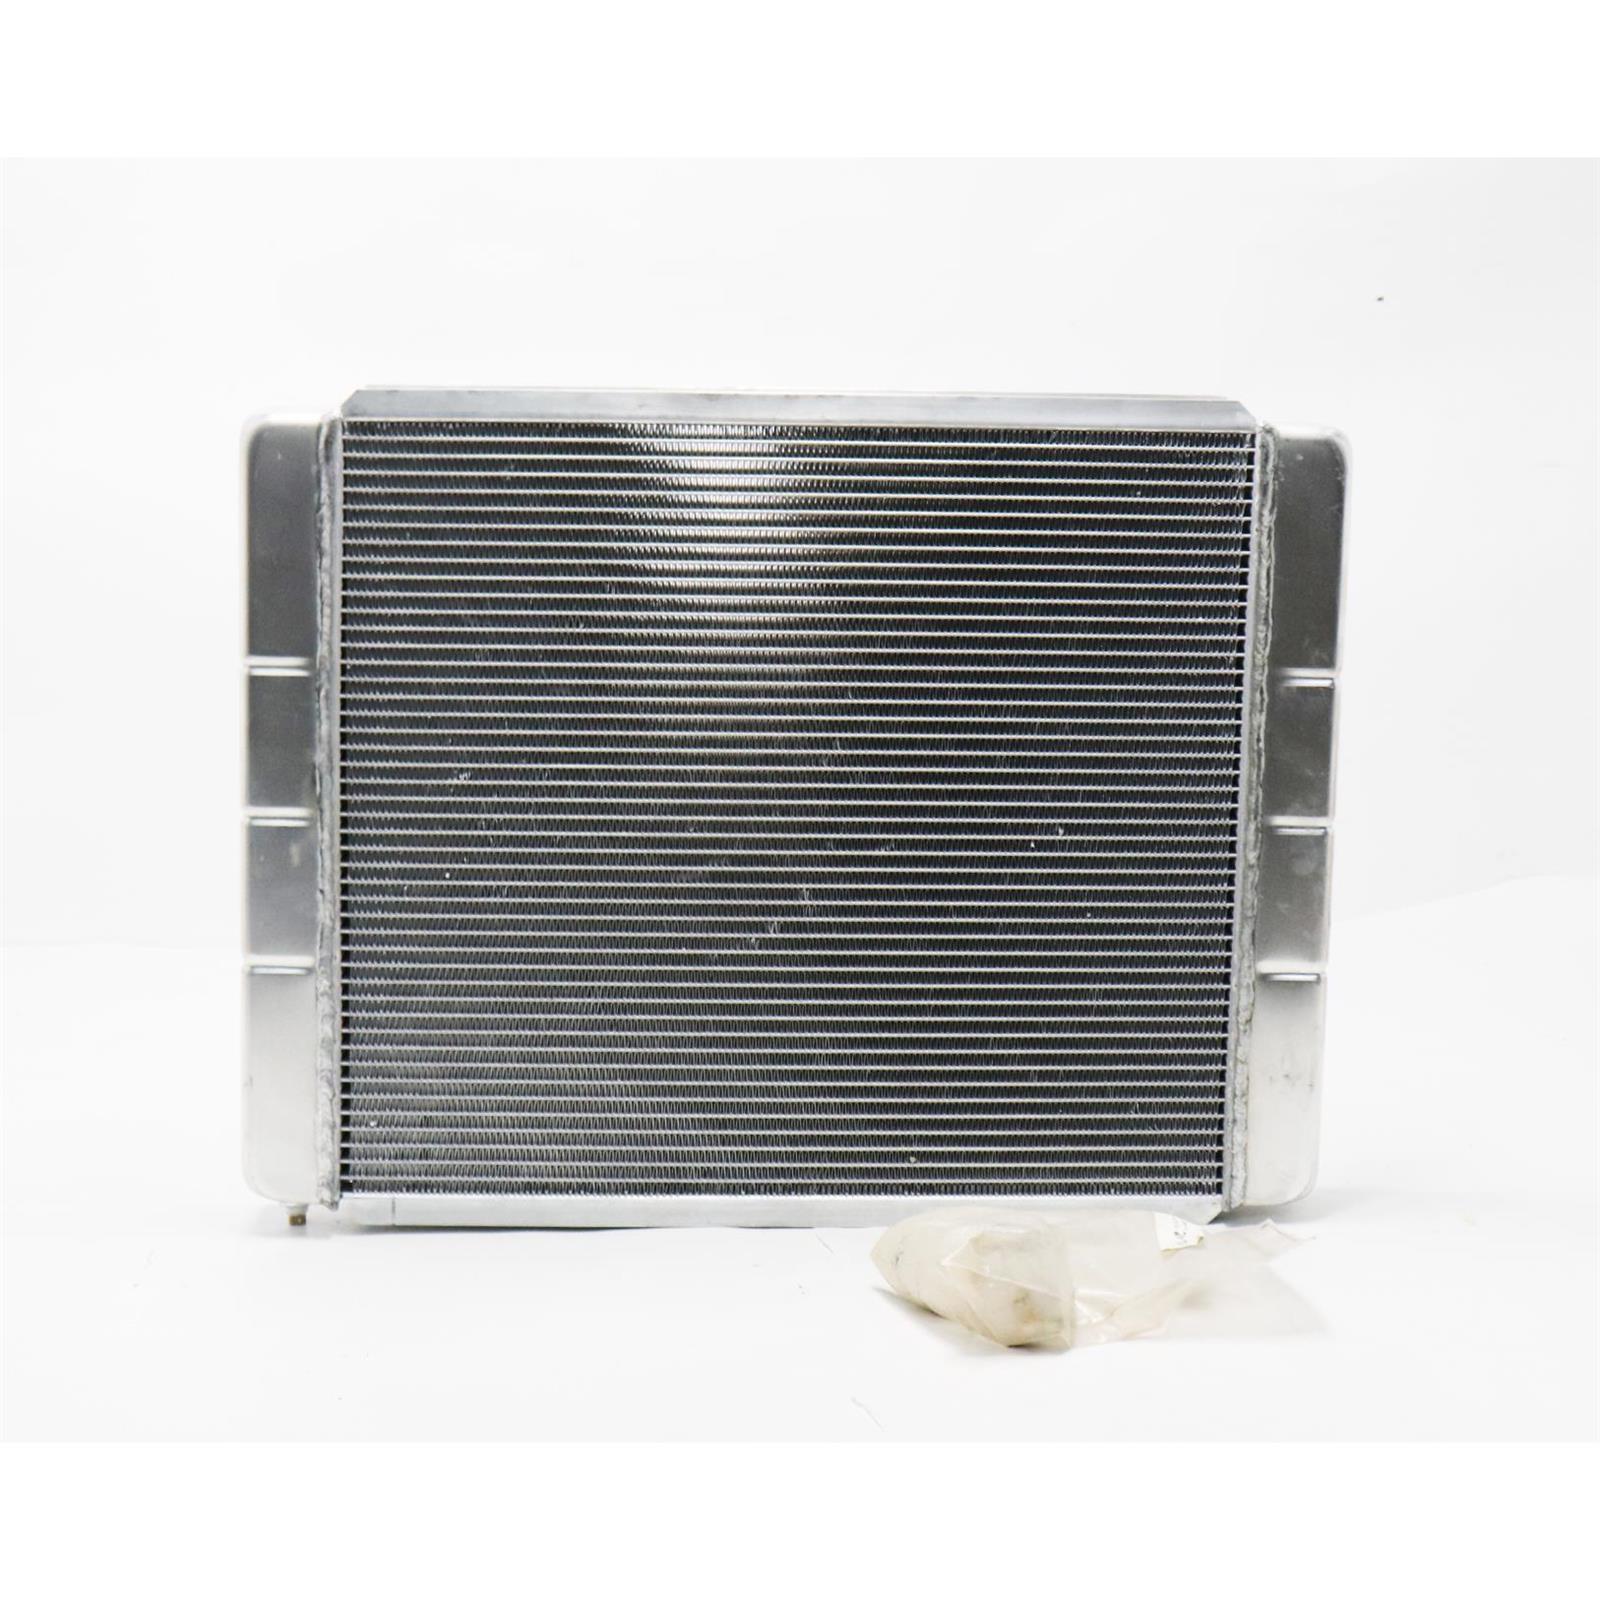 "2 Row Universal Fabricated Aluminum Racing Radiator For Ford Mopar 24/"" x19/"" x3/"""